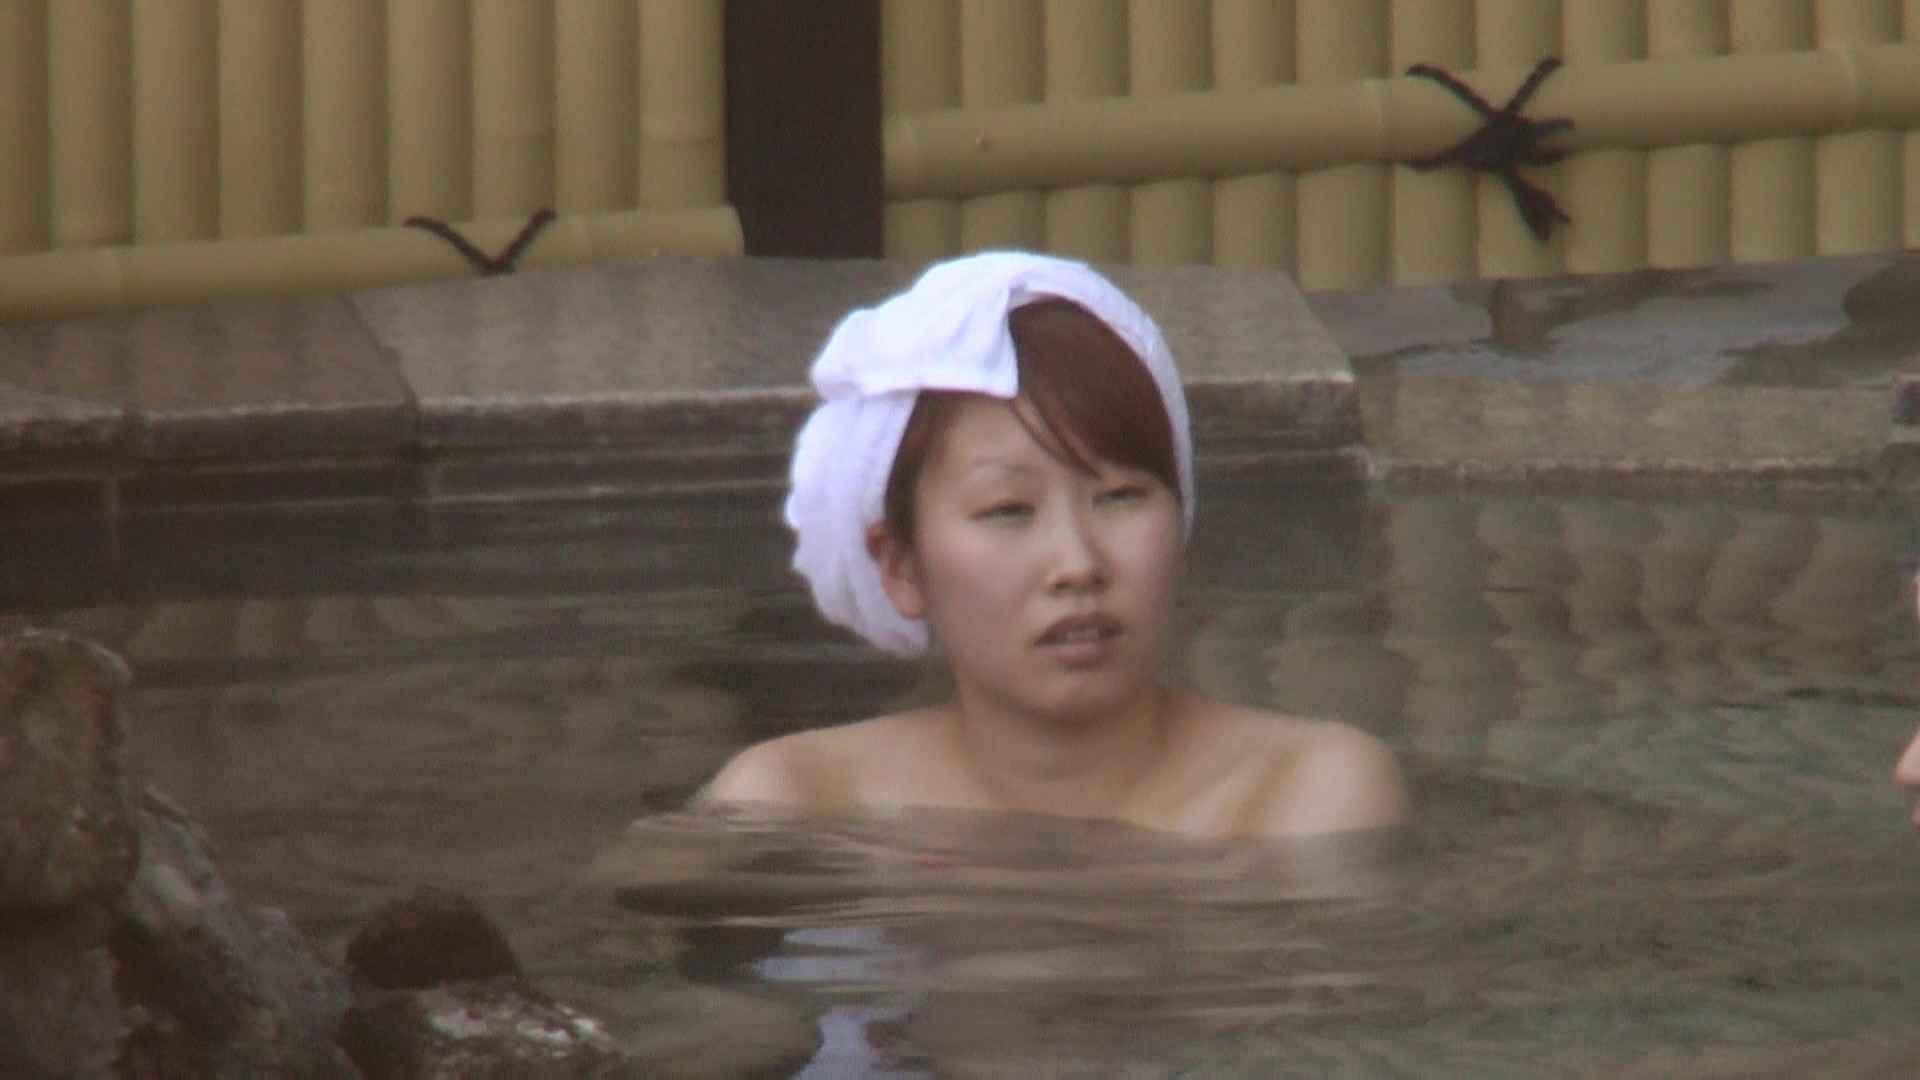 Aquaな露天風呂Vol.210 露天風呂編  86PIX 54